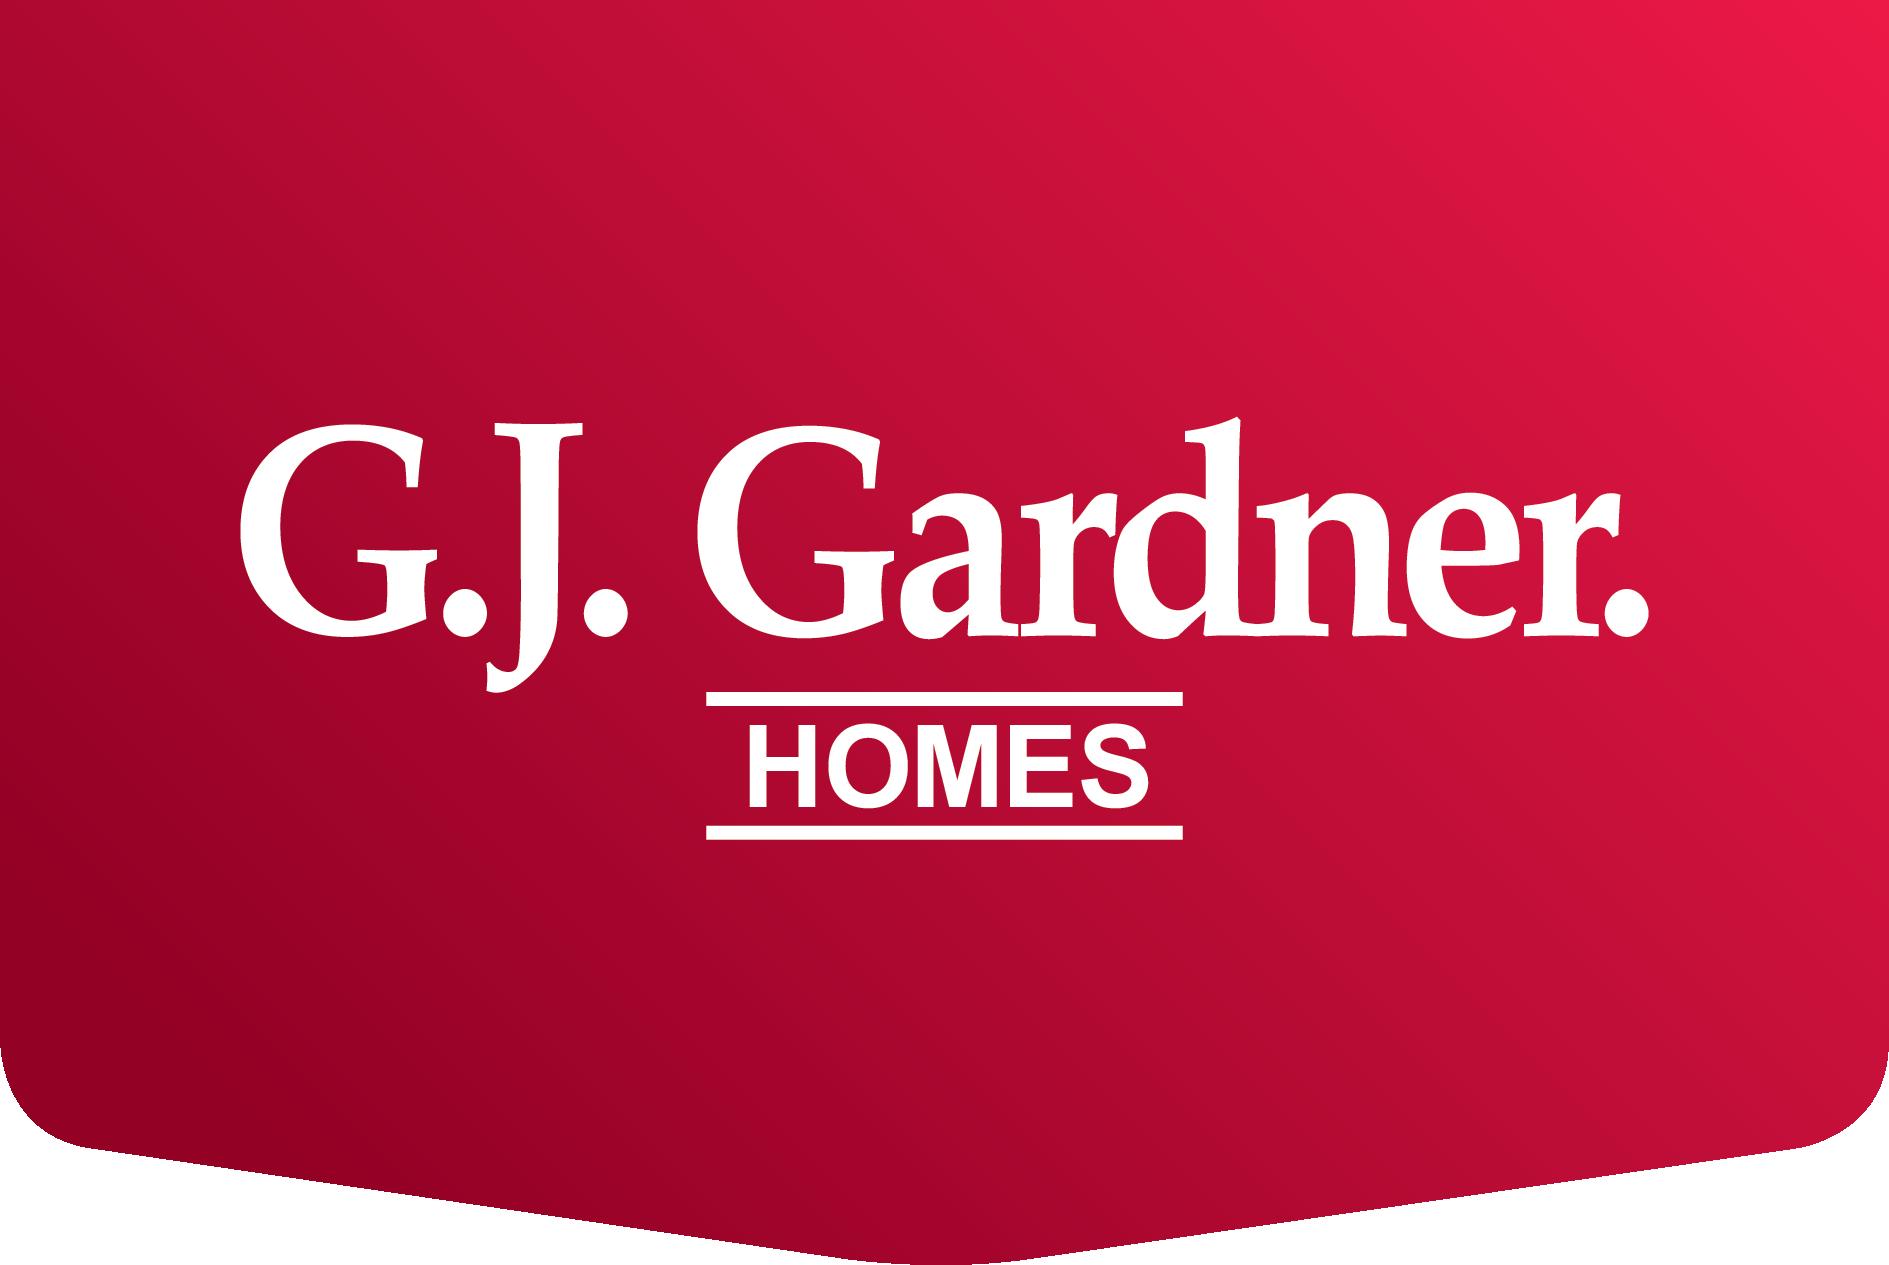 G.J. Gardner Homes-Launceston